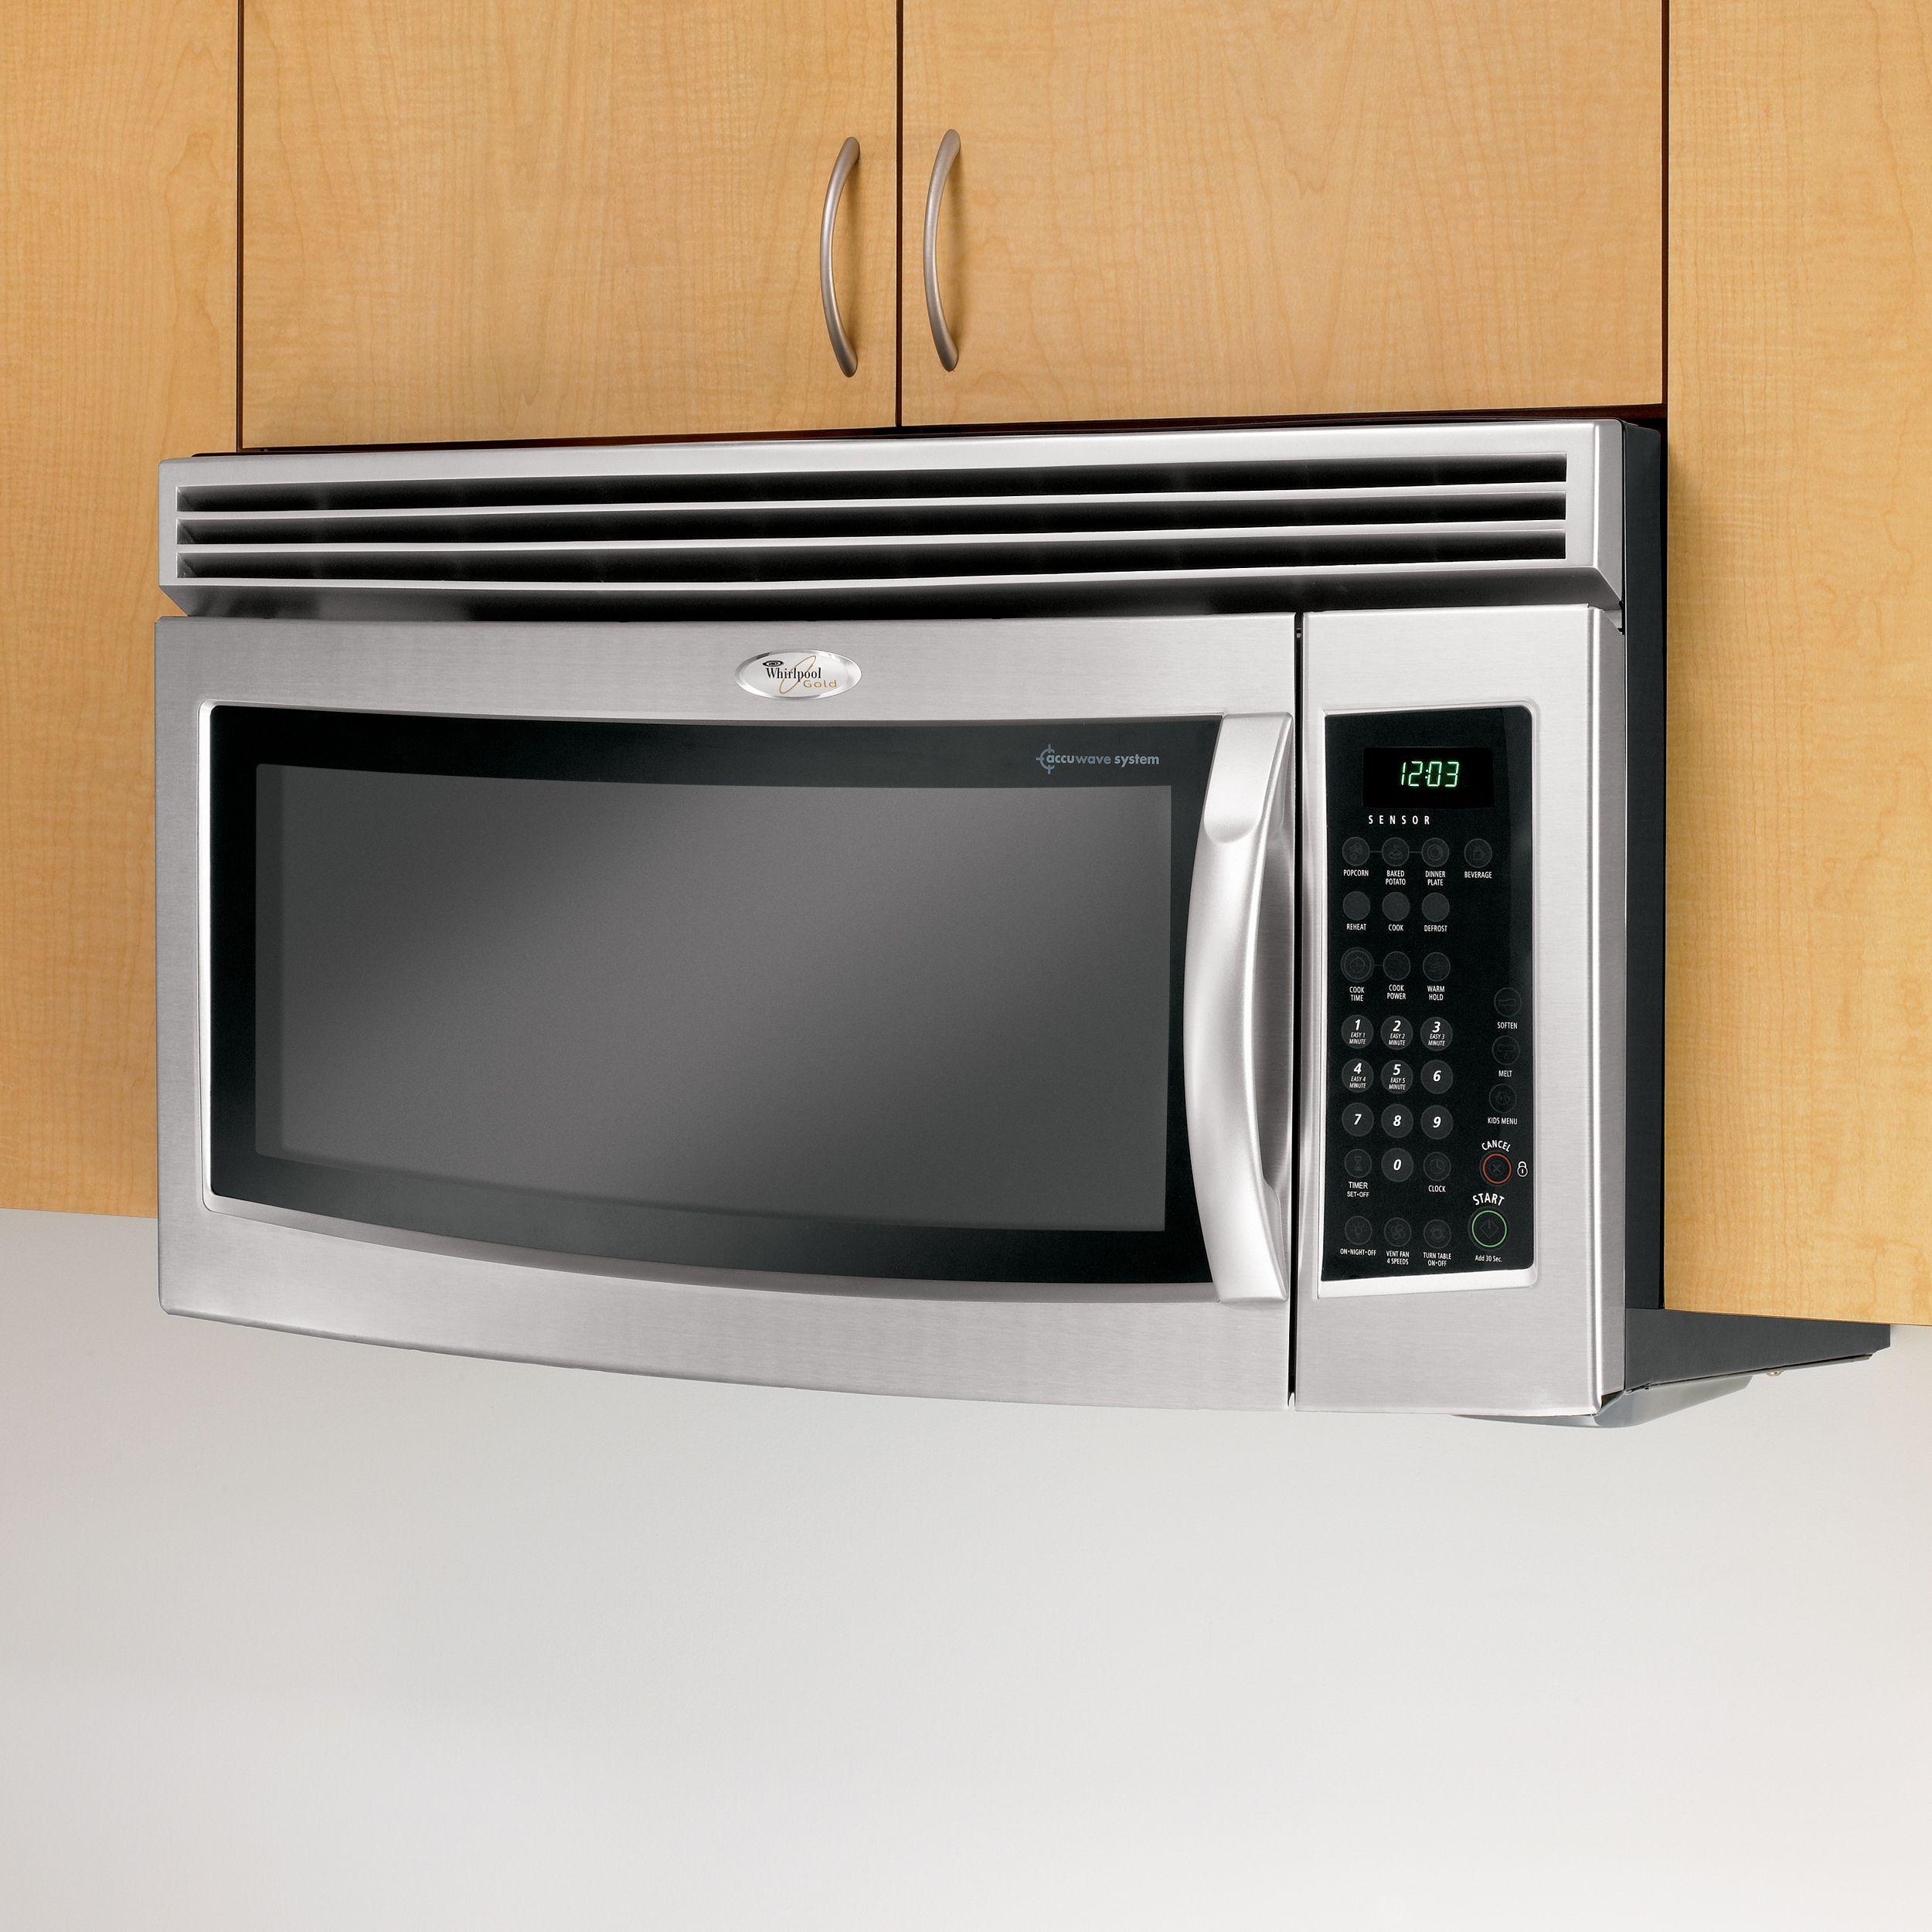 Whirlpool Over Range Microwave 1.8 Cu. Ft. Gh5184xp - Sears